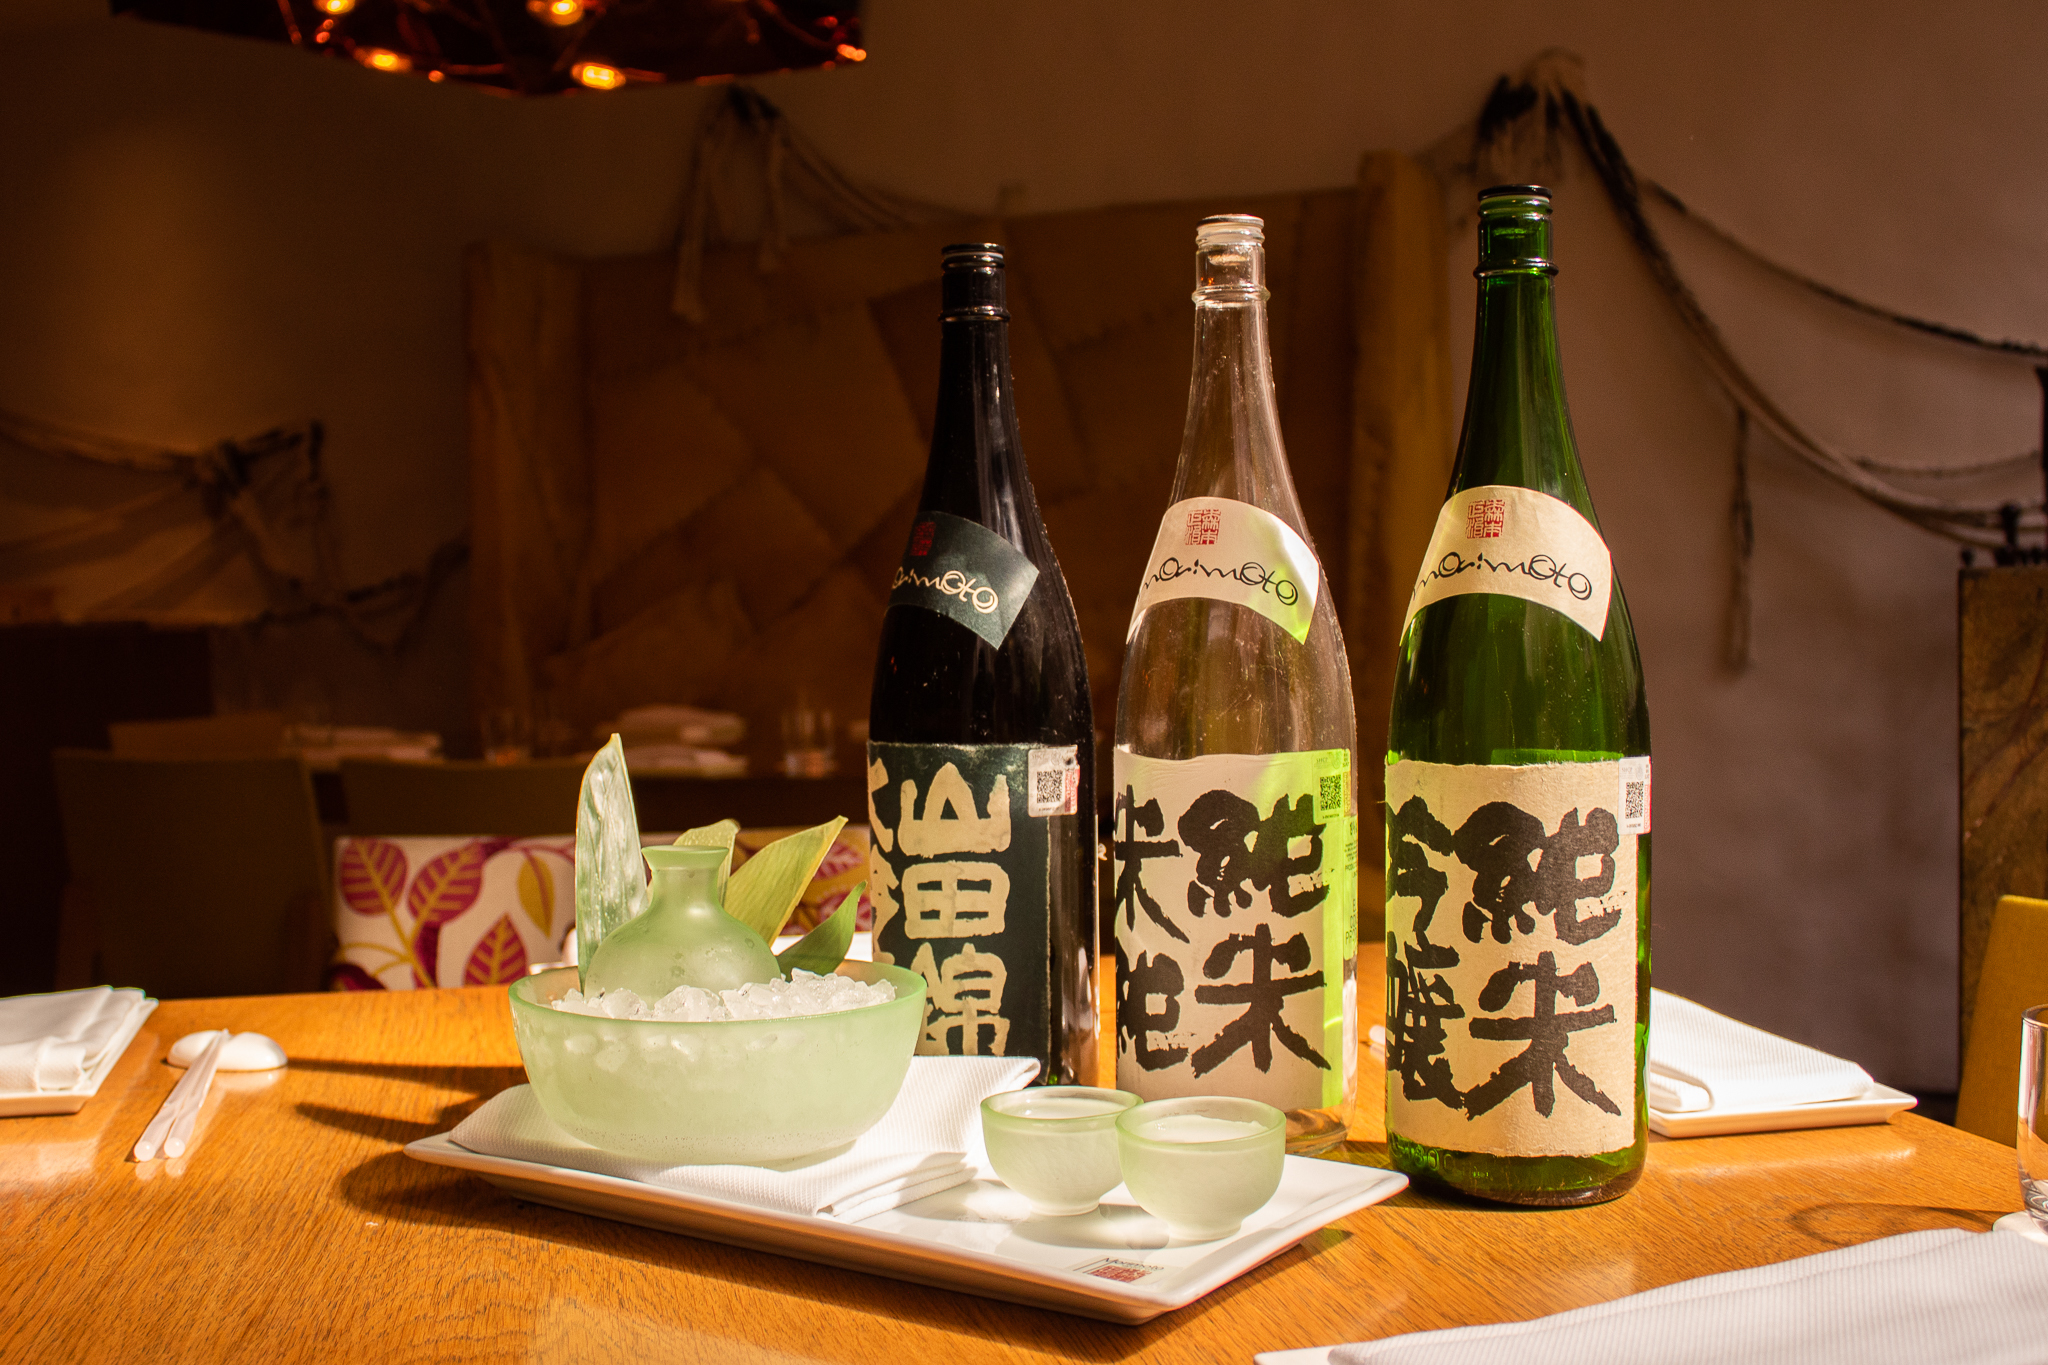 Morimoto sake